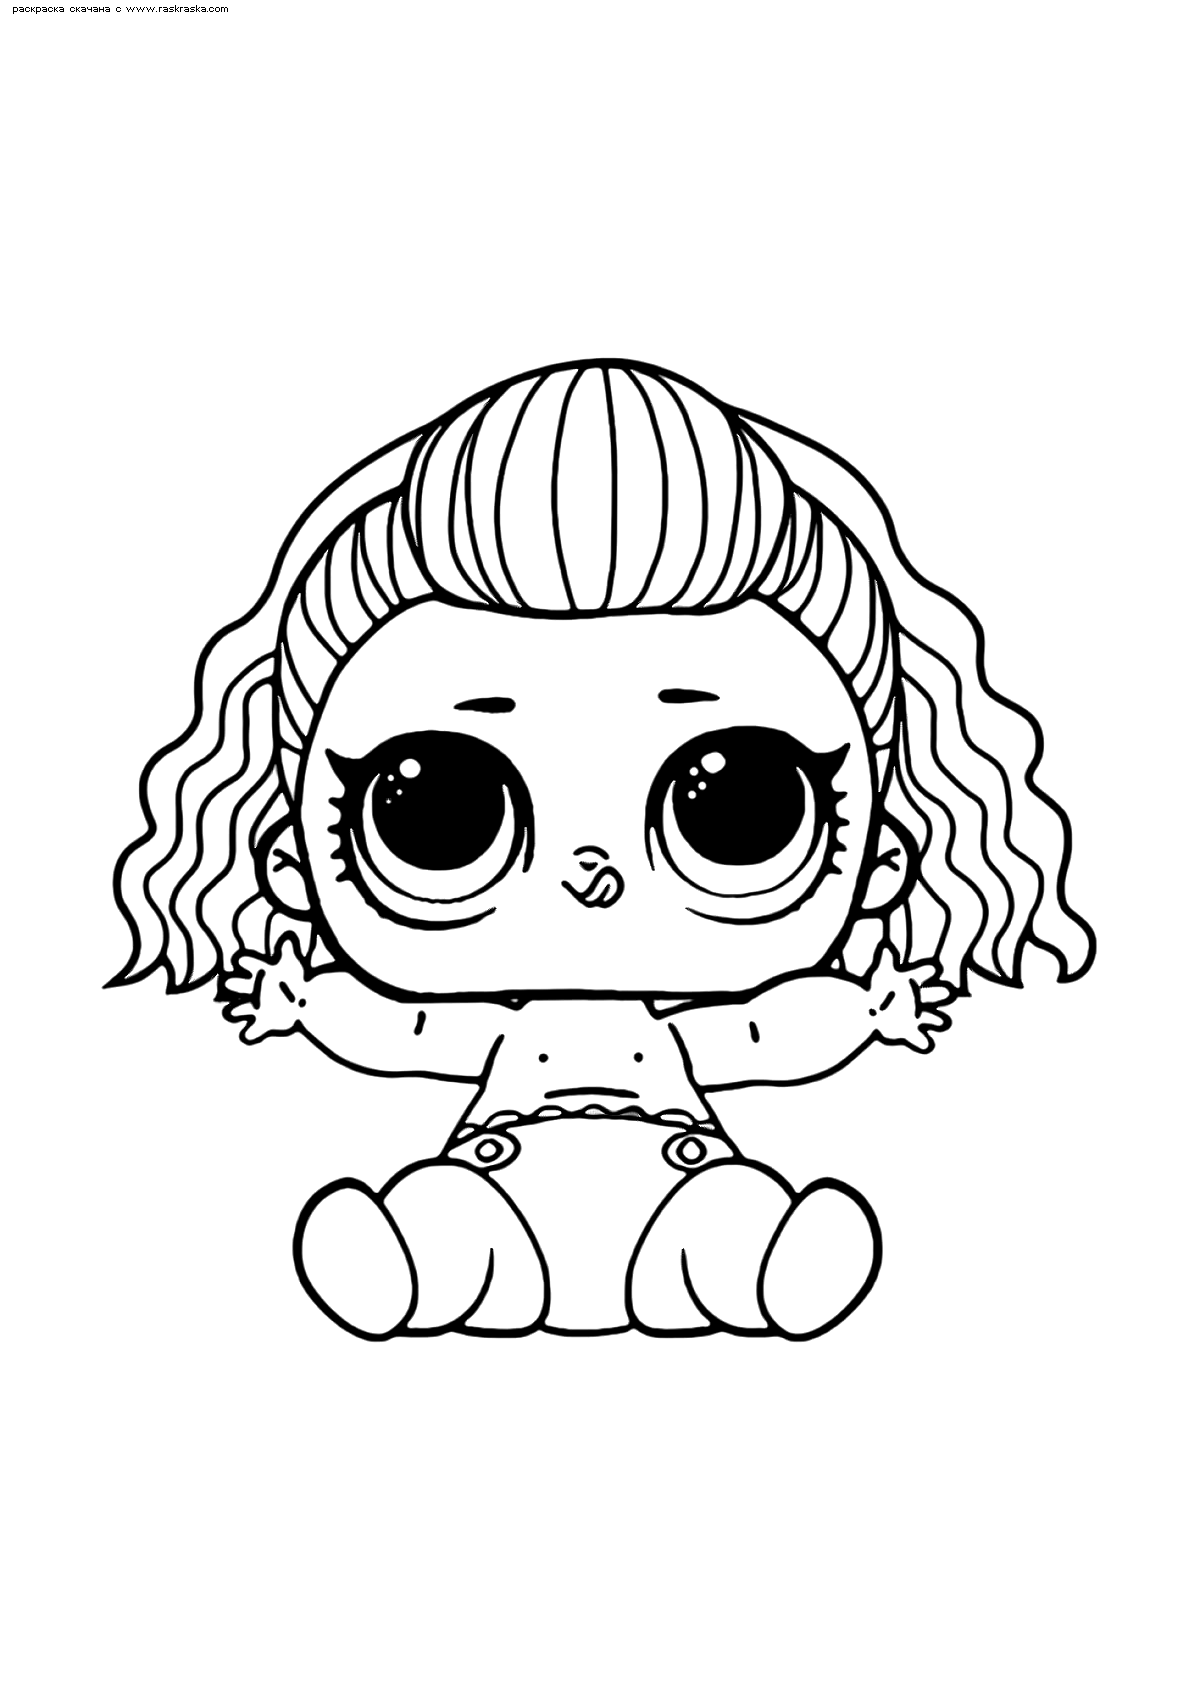 Раскраска ЛОЛ малышка БиБи из 80-х | Раскраски ЛОЛ ...